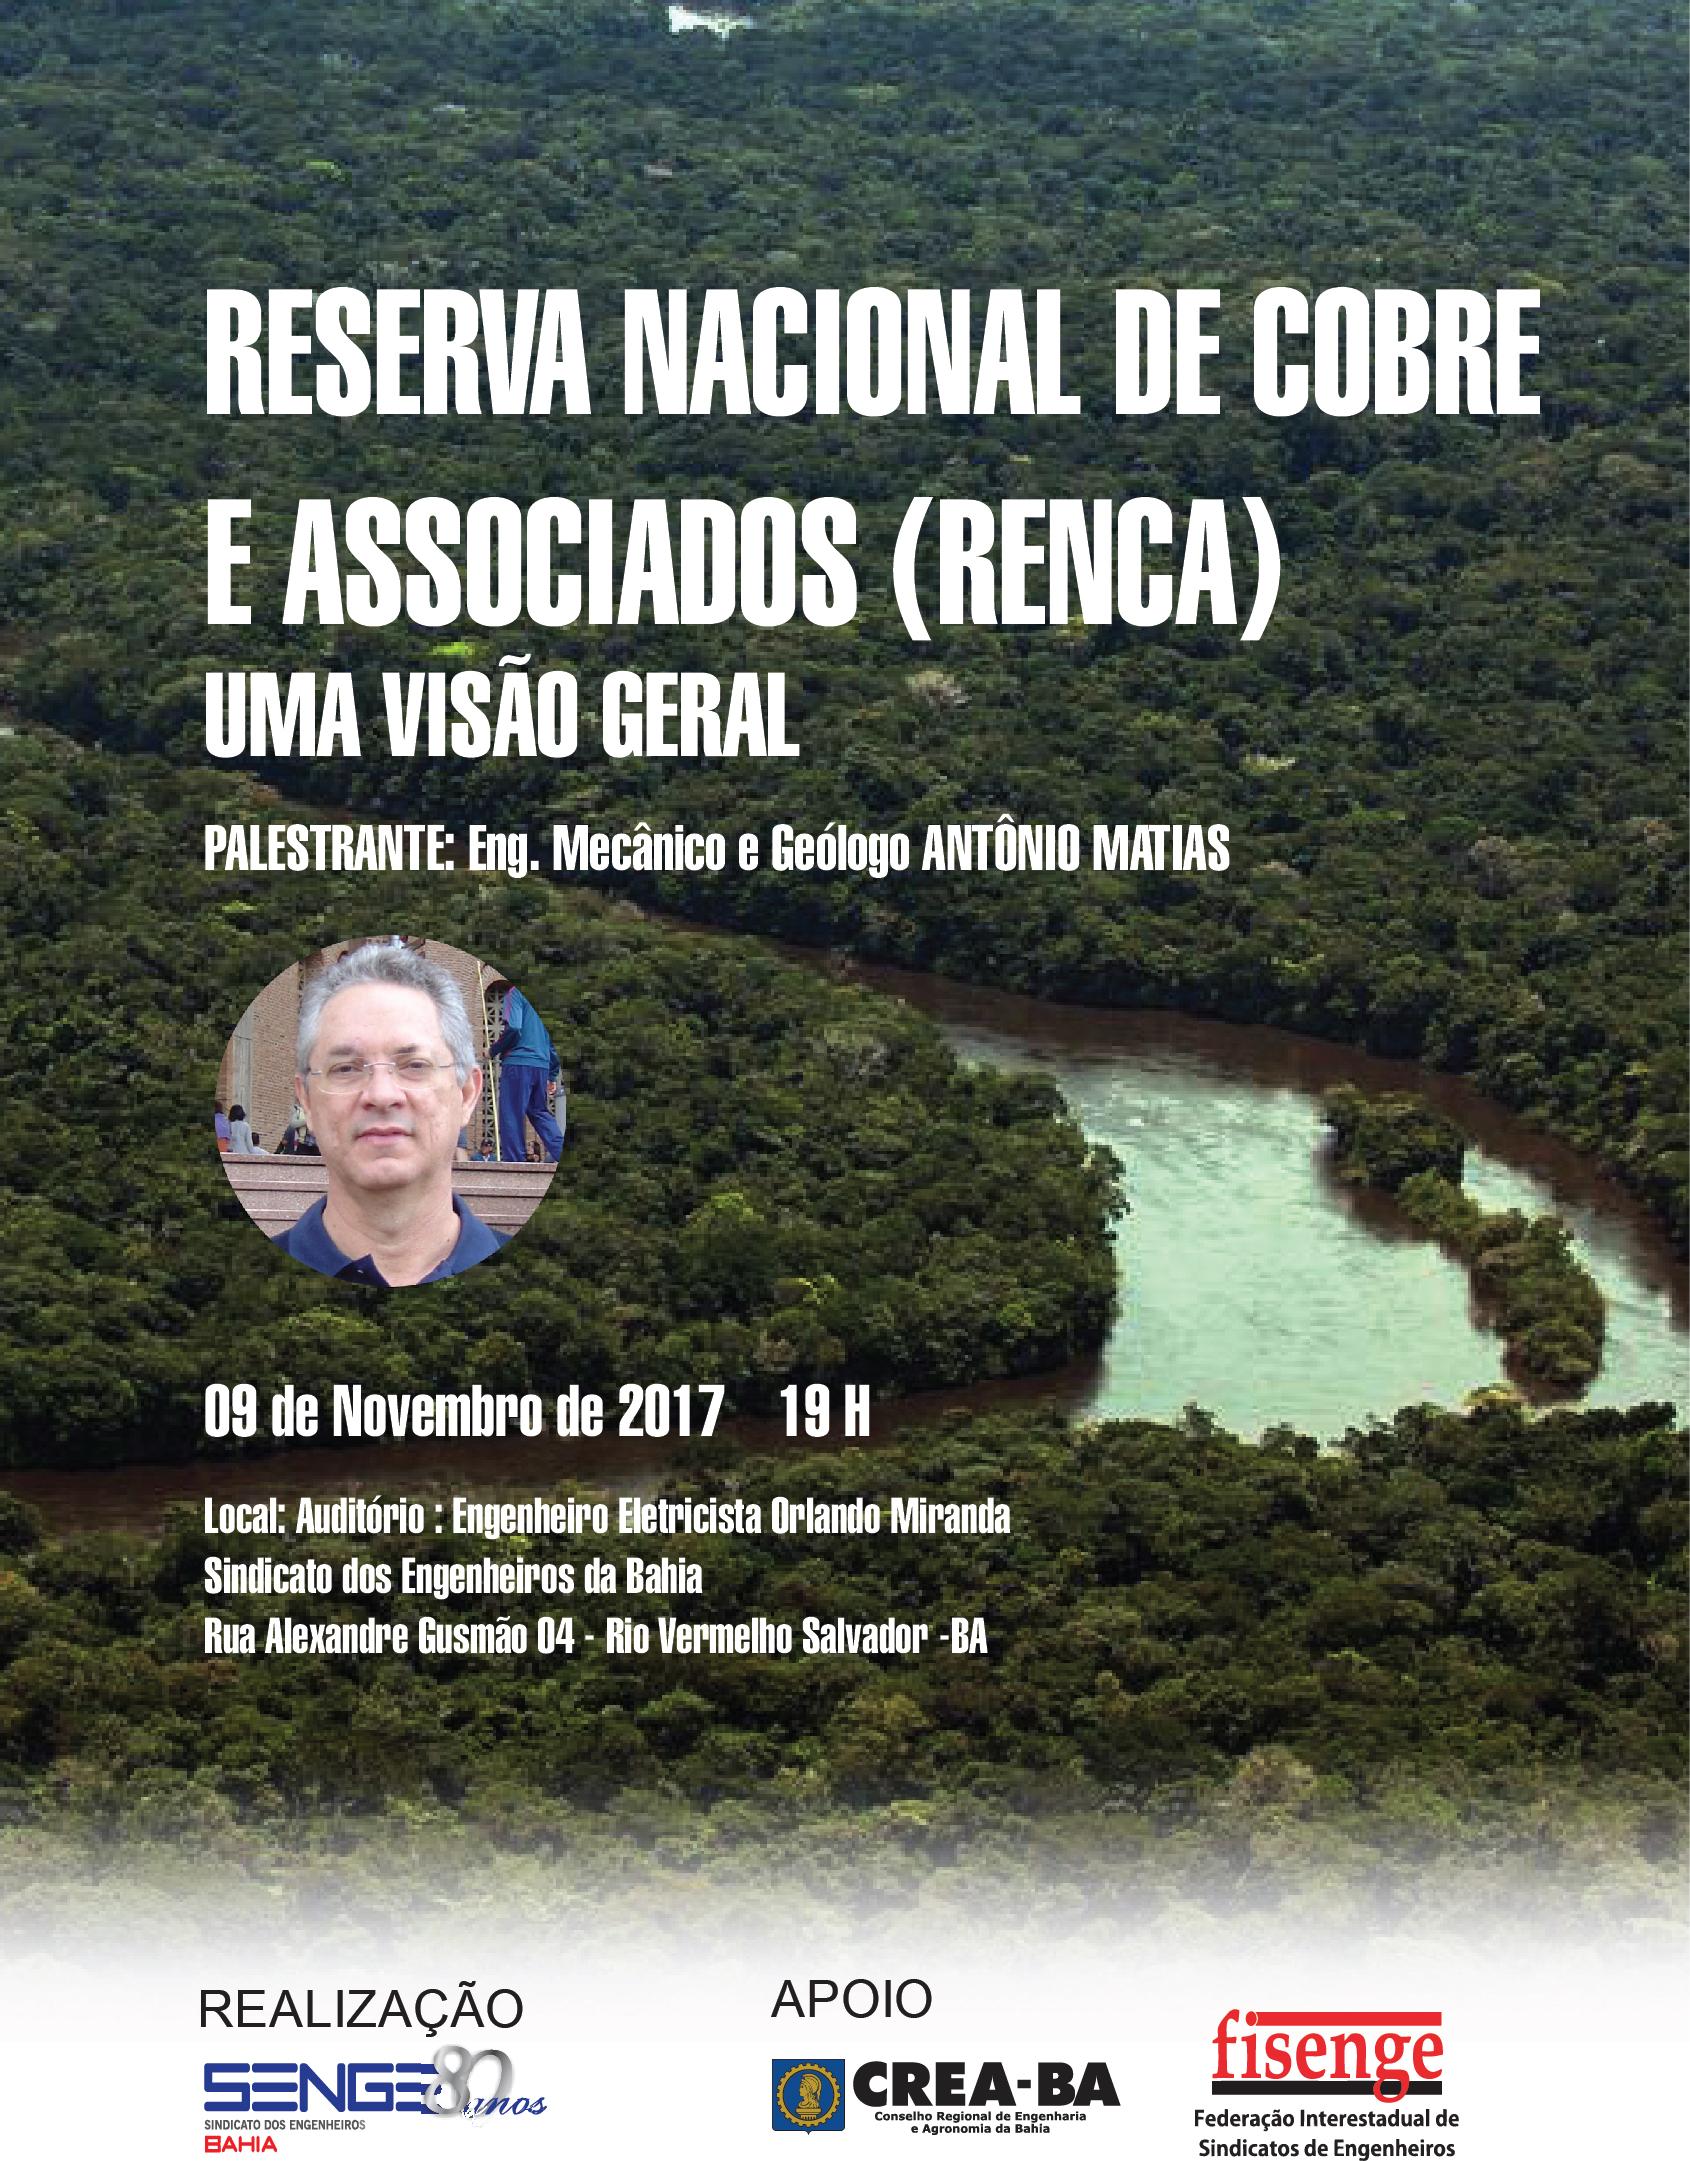 Senge-BA promove palestra sobre a RENCA